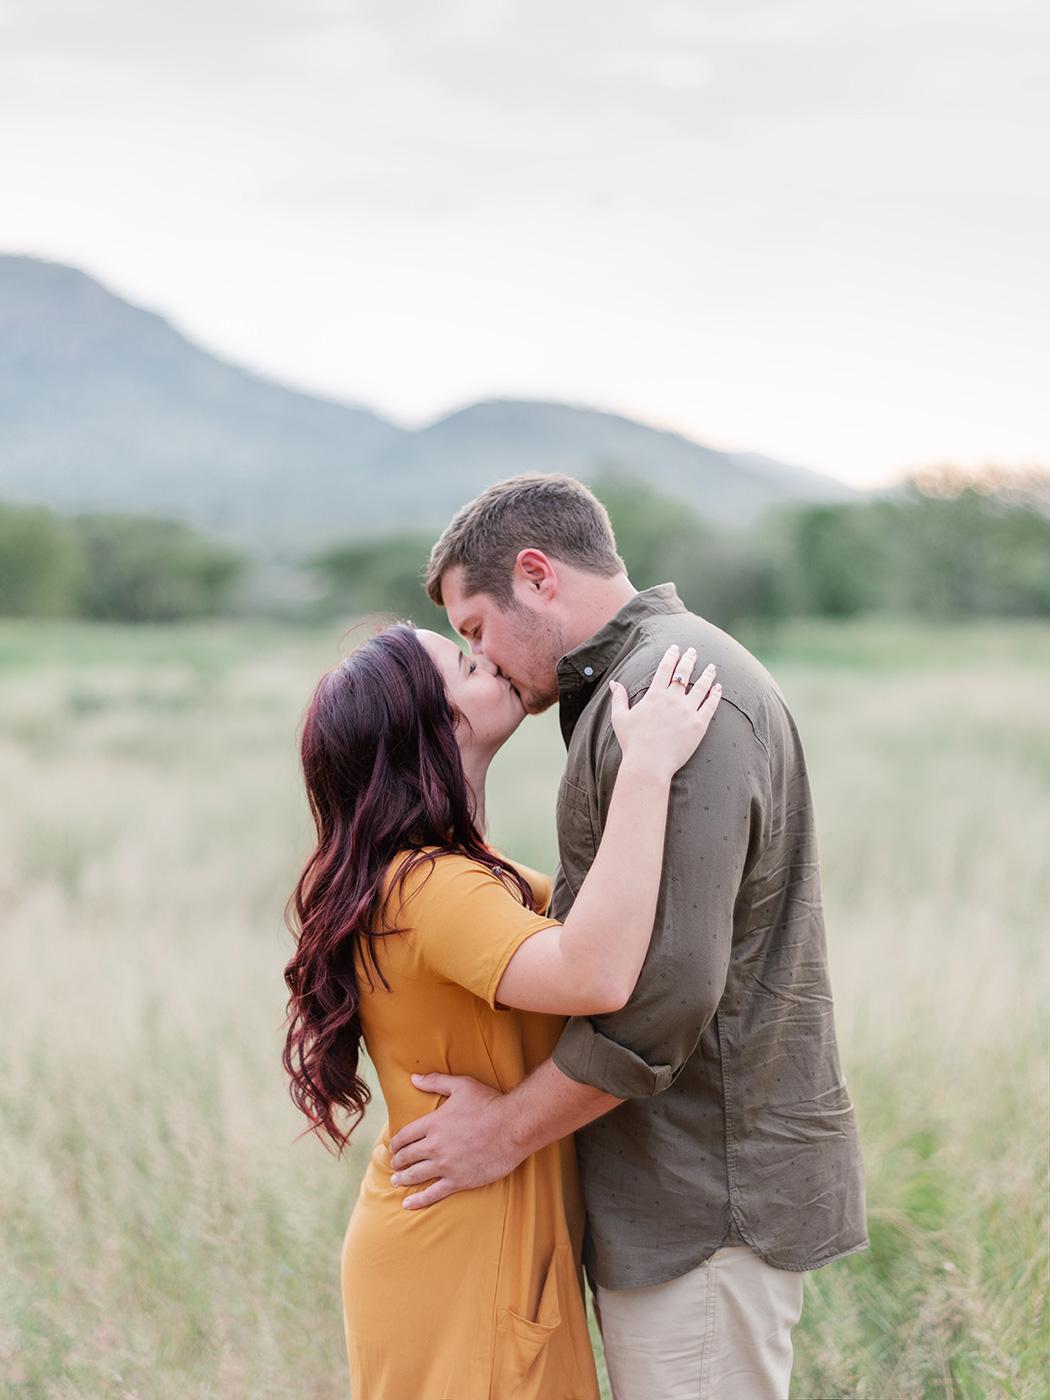 Couple Kiss | Rensche Mari